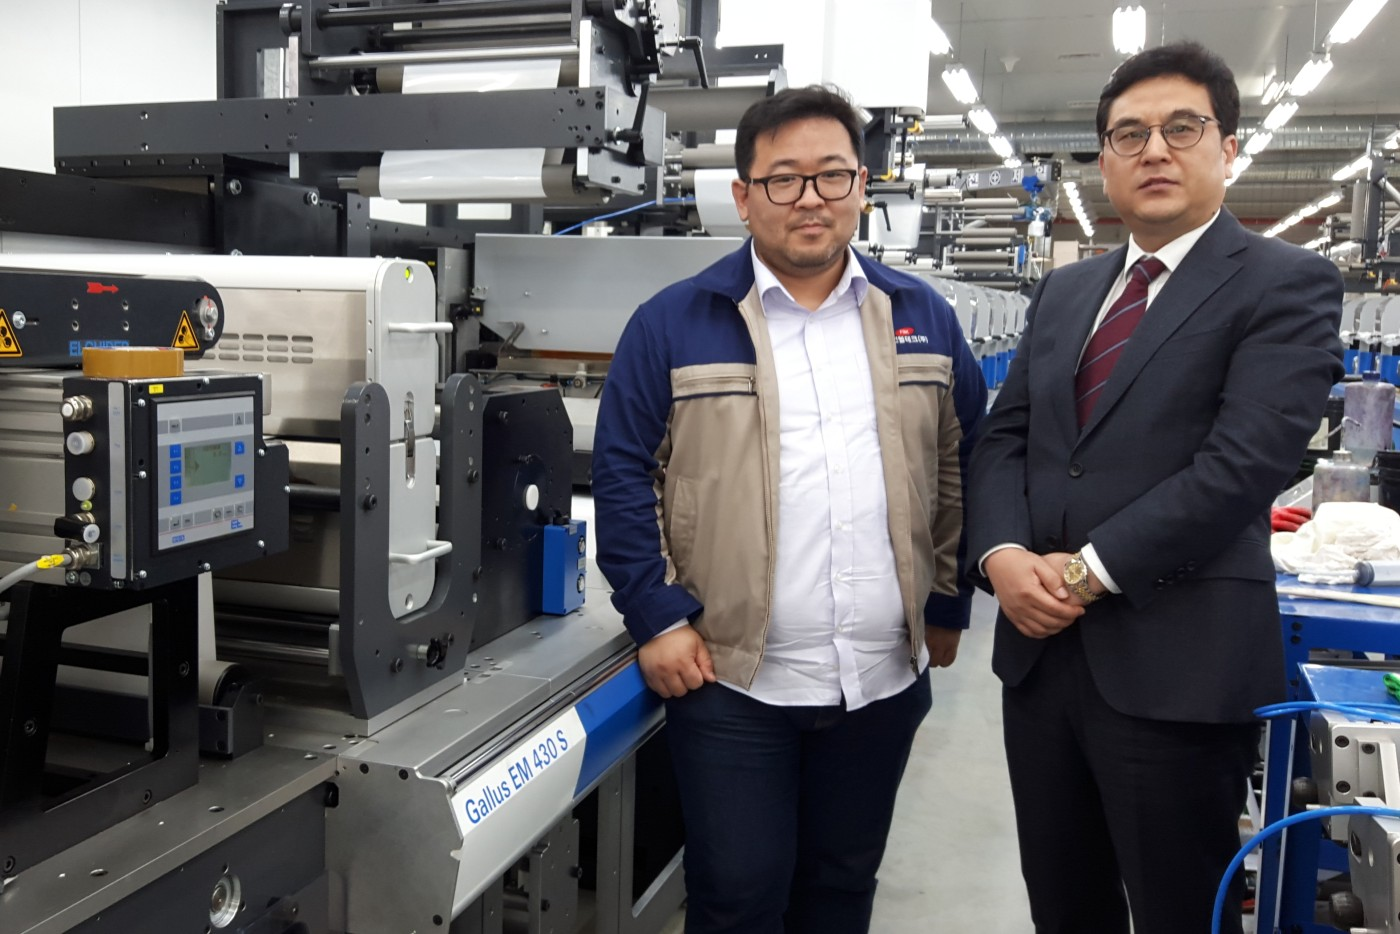 20180816_2_FineWebtechLabelSolution_Korea